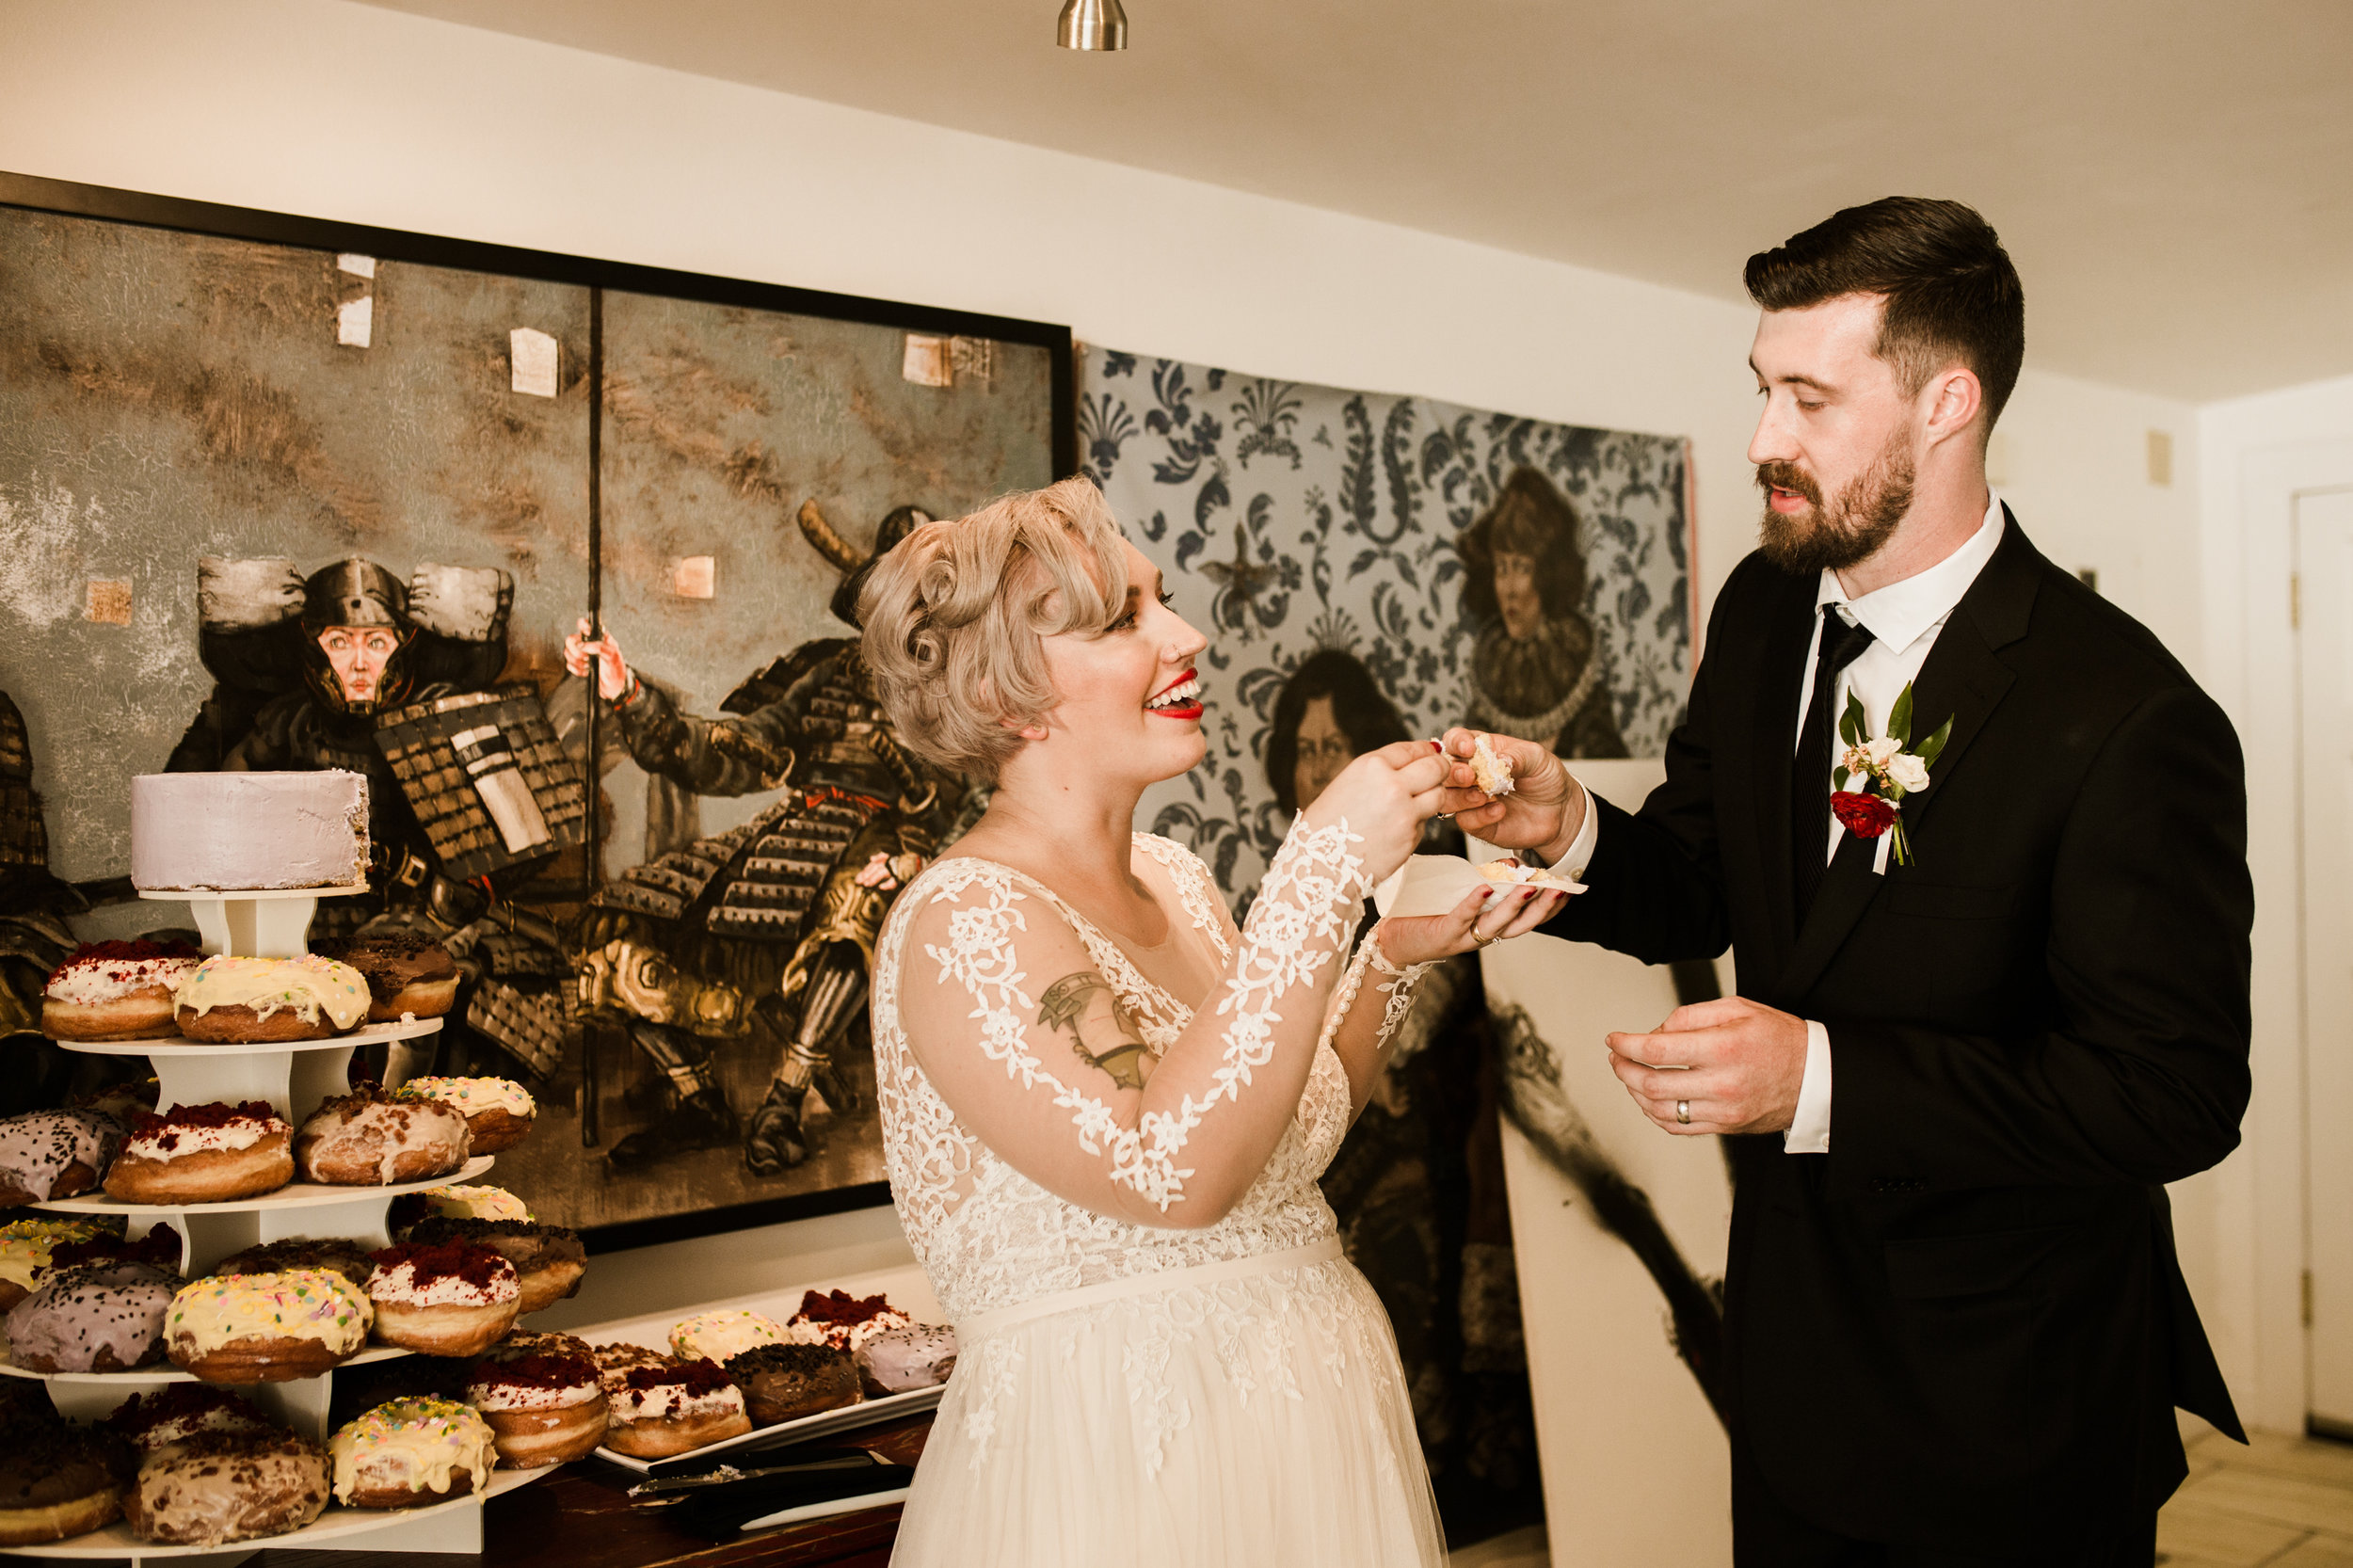 Kentucky Wedding Louisville Wedding Photographer 2018 Crystal Ludwick Photo Louisville Wedding Photographer Kentucky Wedding Photographer (82 of 105).jpg